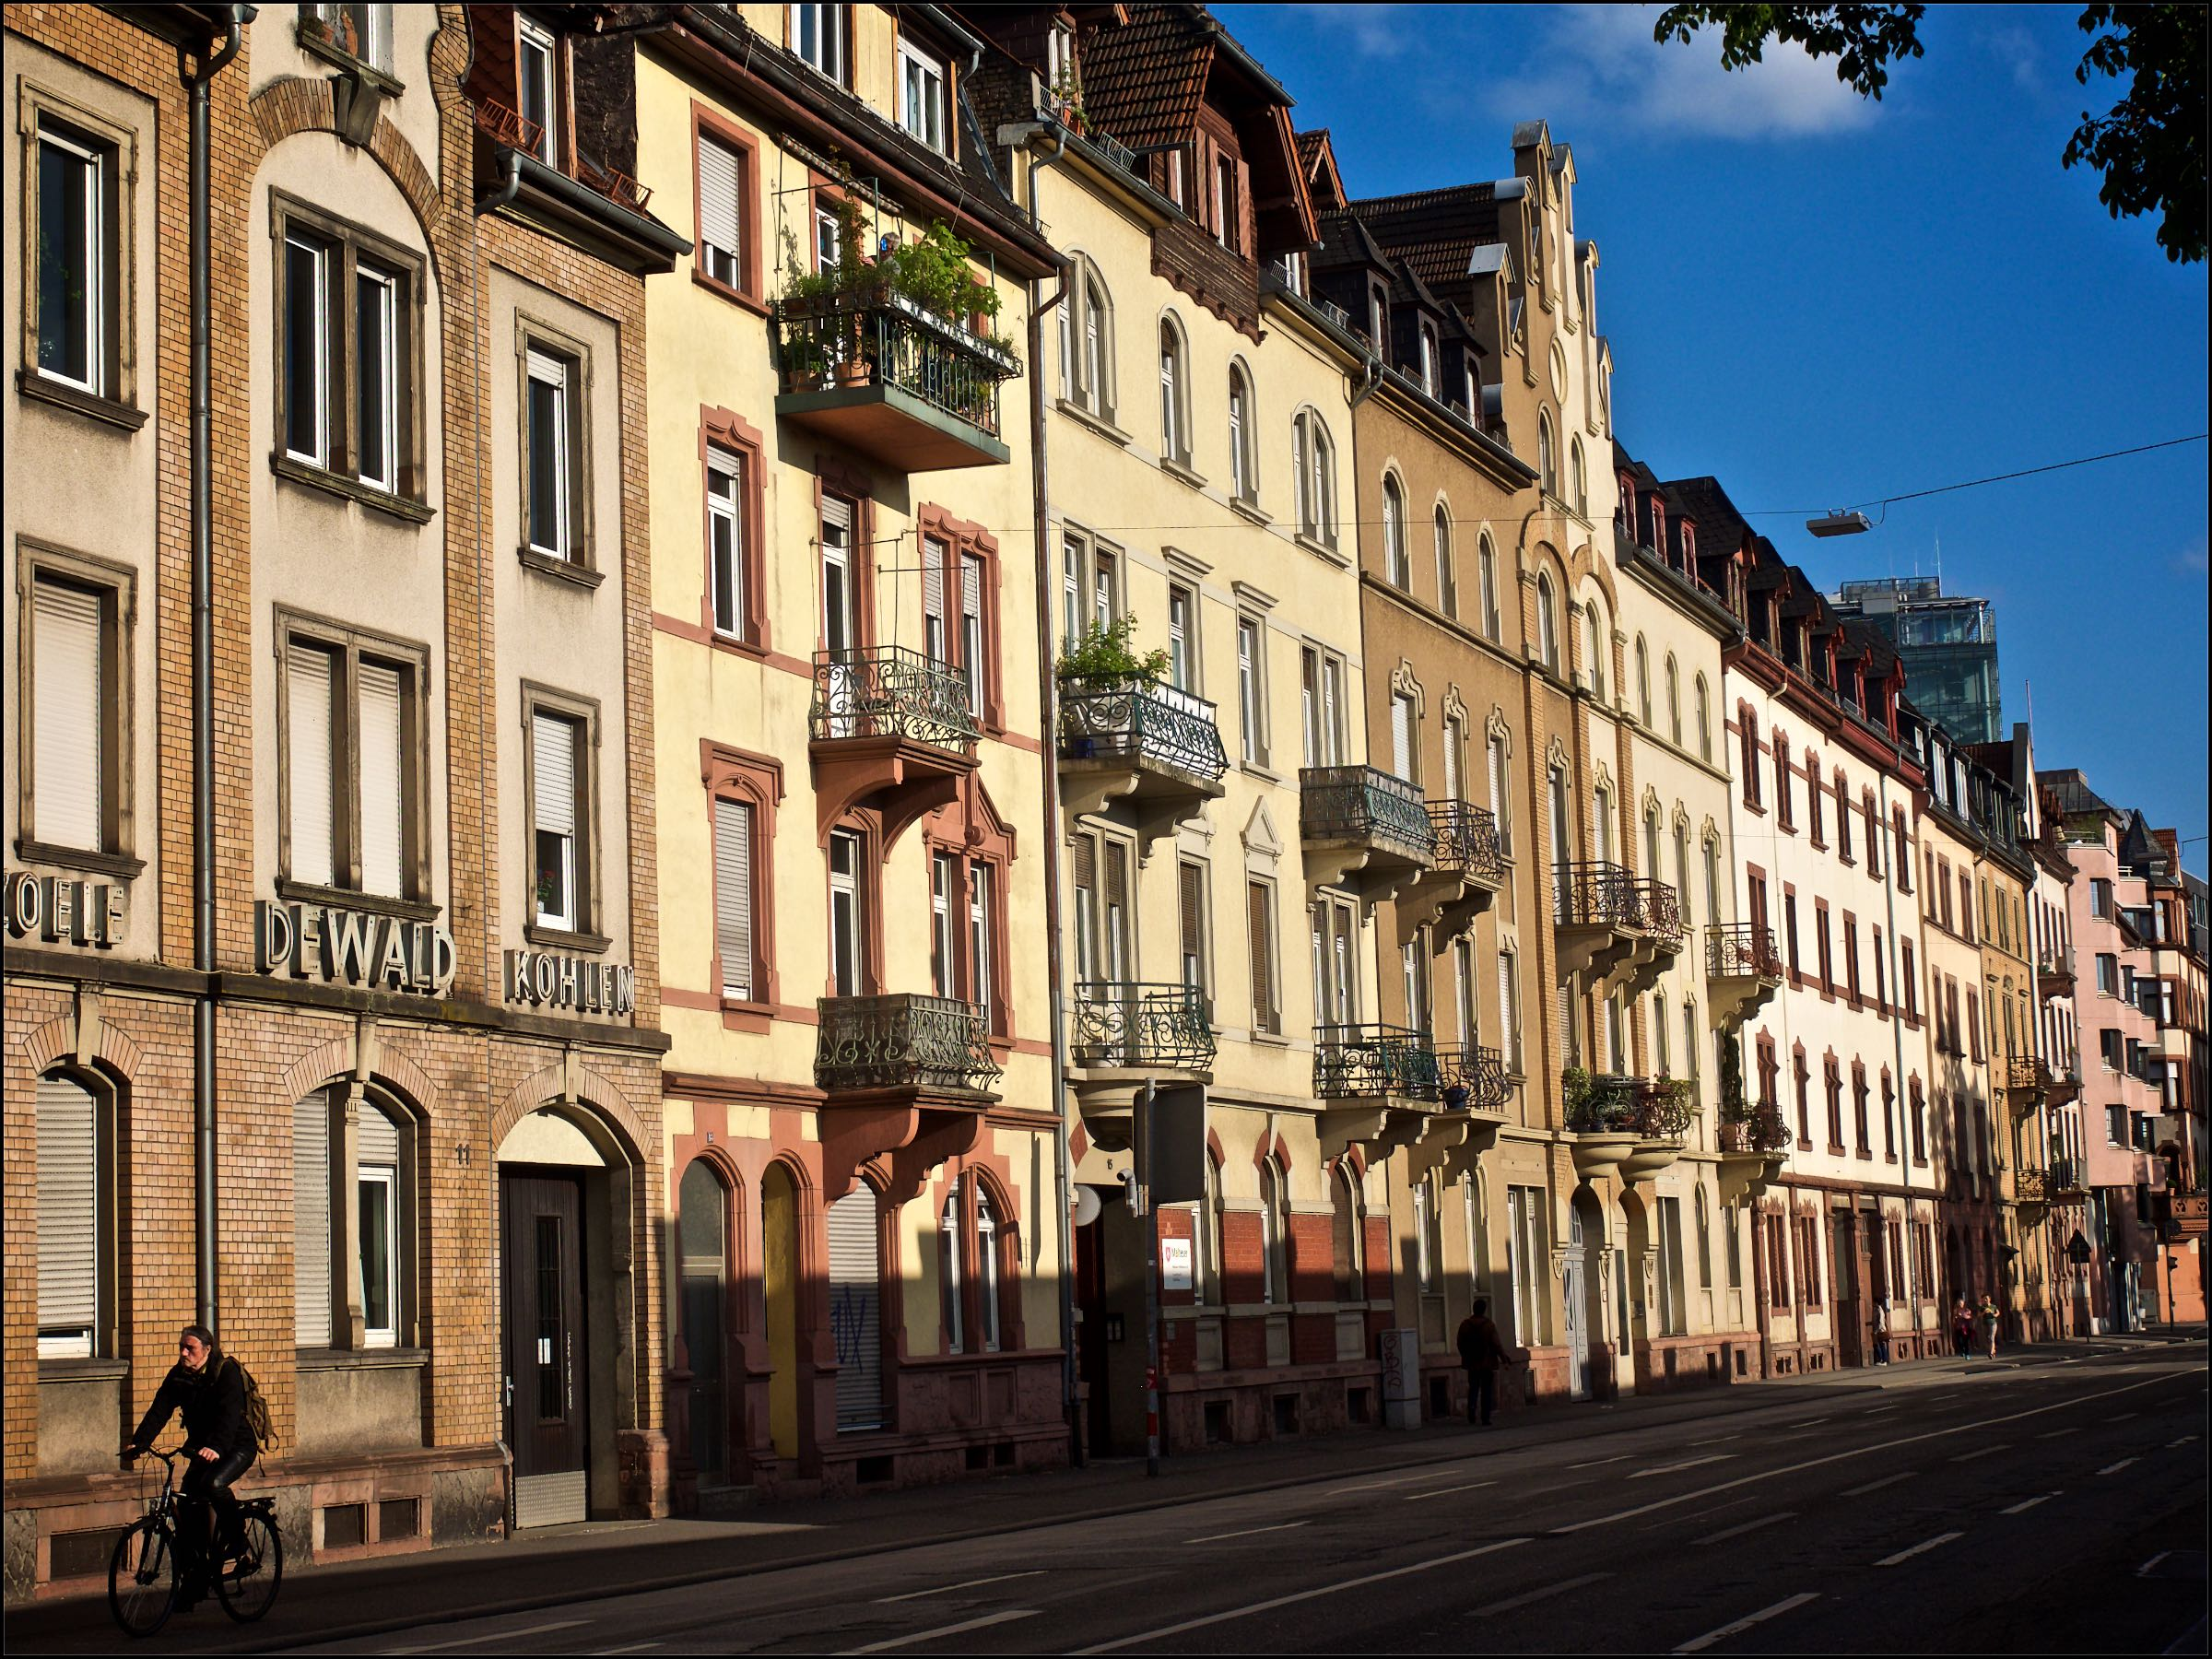 Streets of Heidelberg